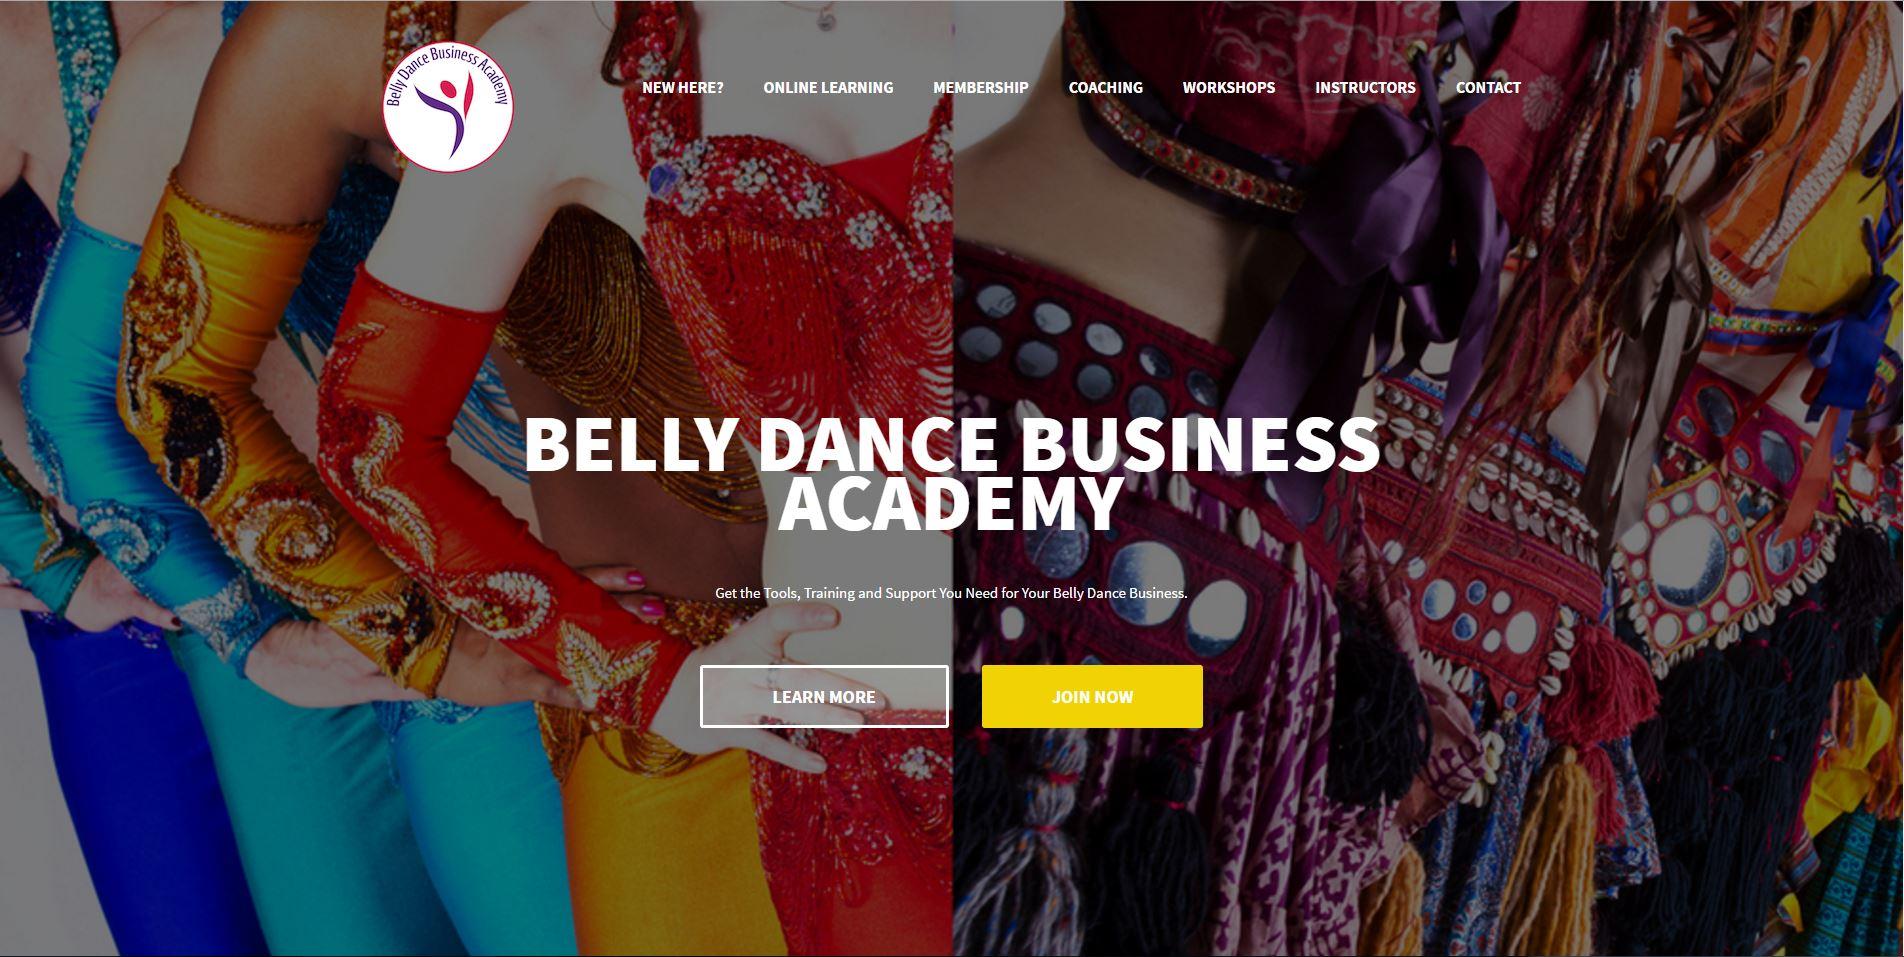 Belly Dance Business Academy